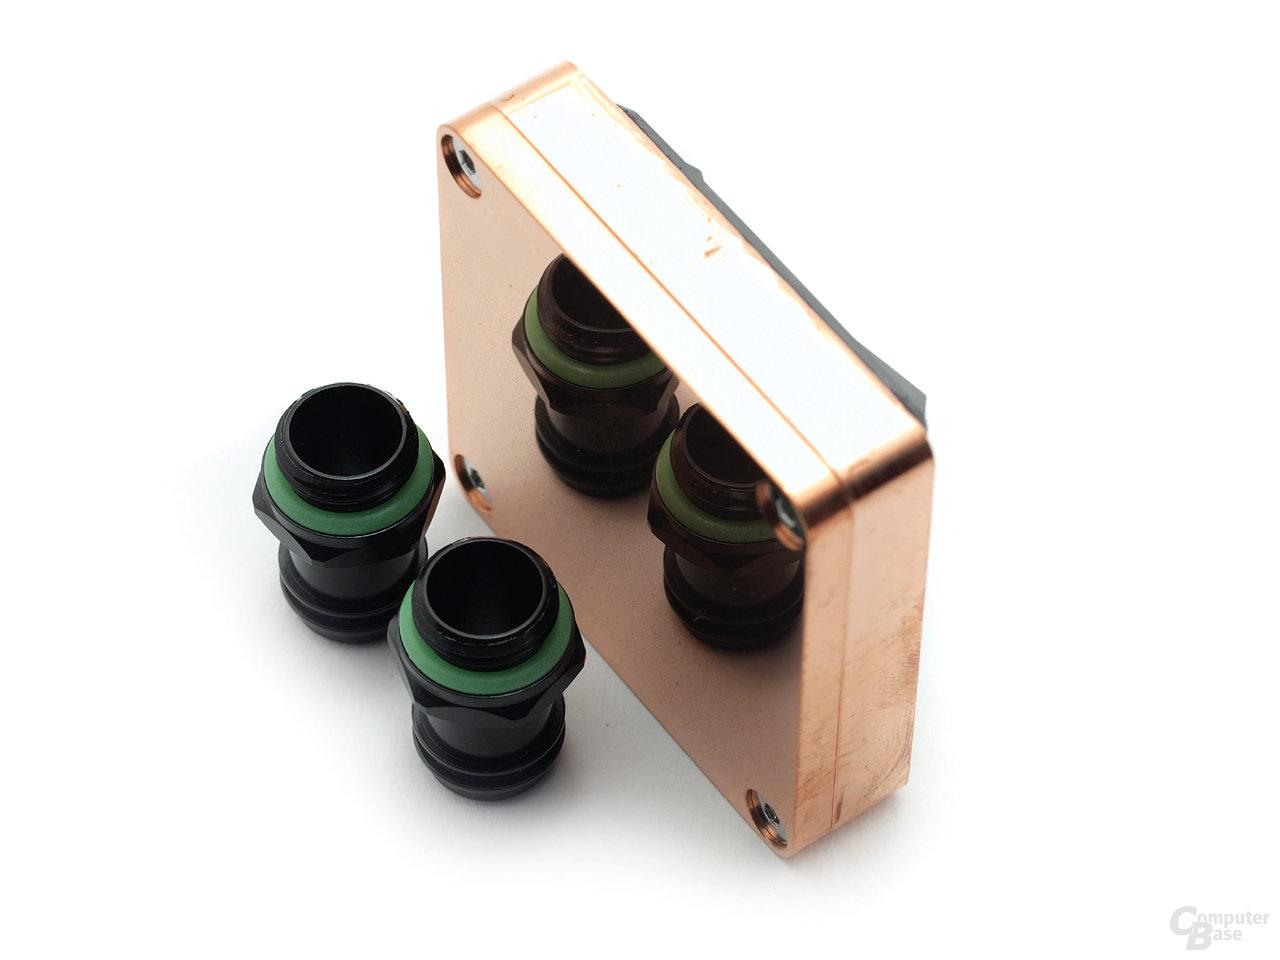 Enzotech Water Block Stealth Full Copper